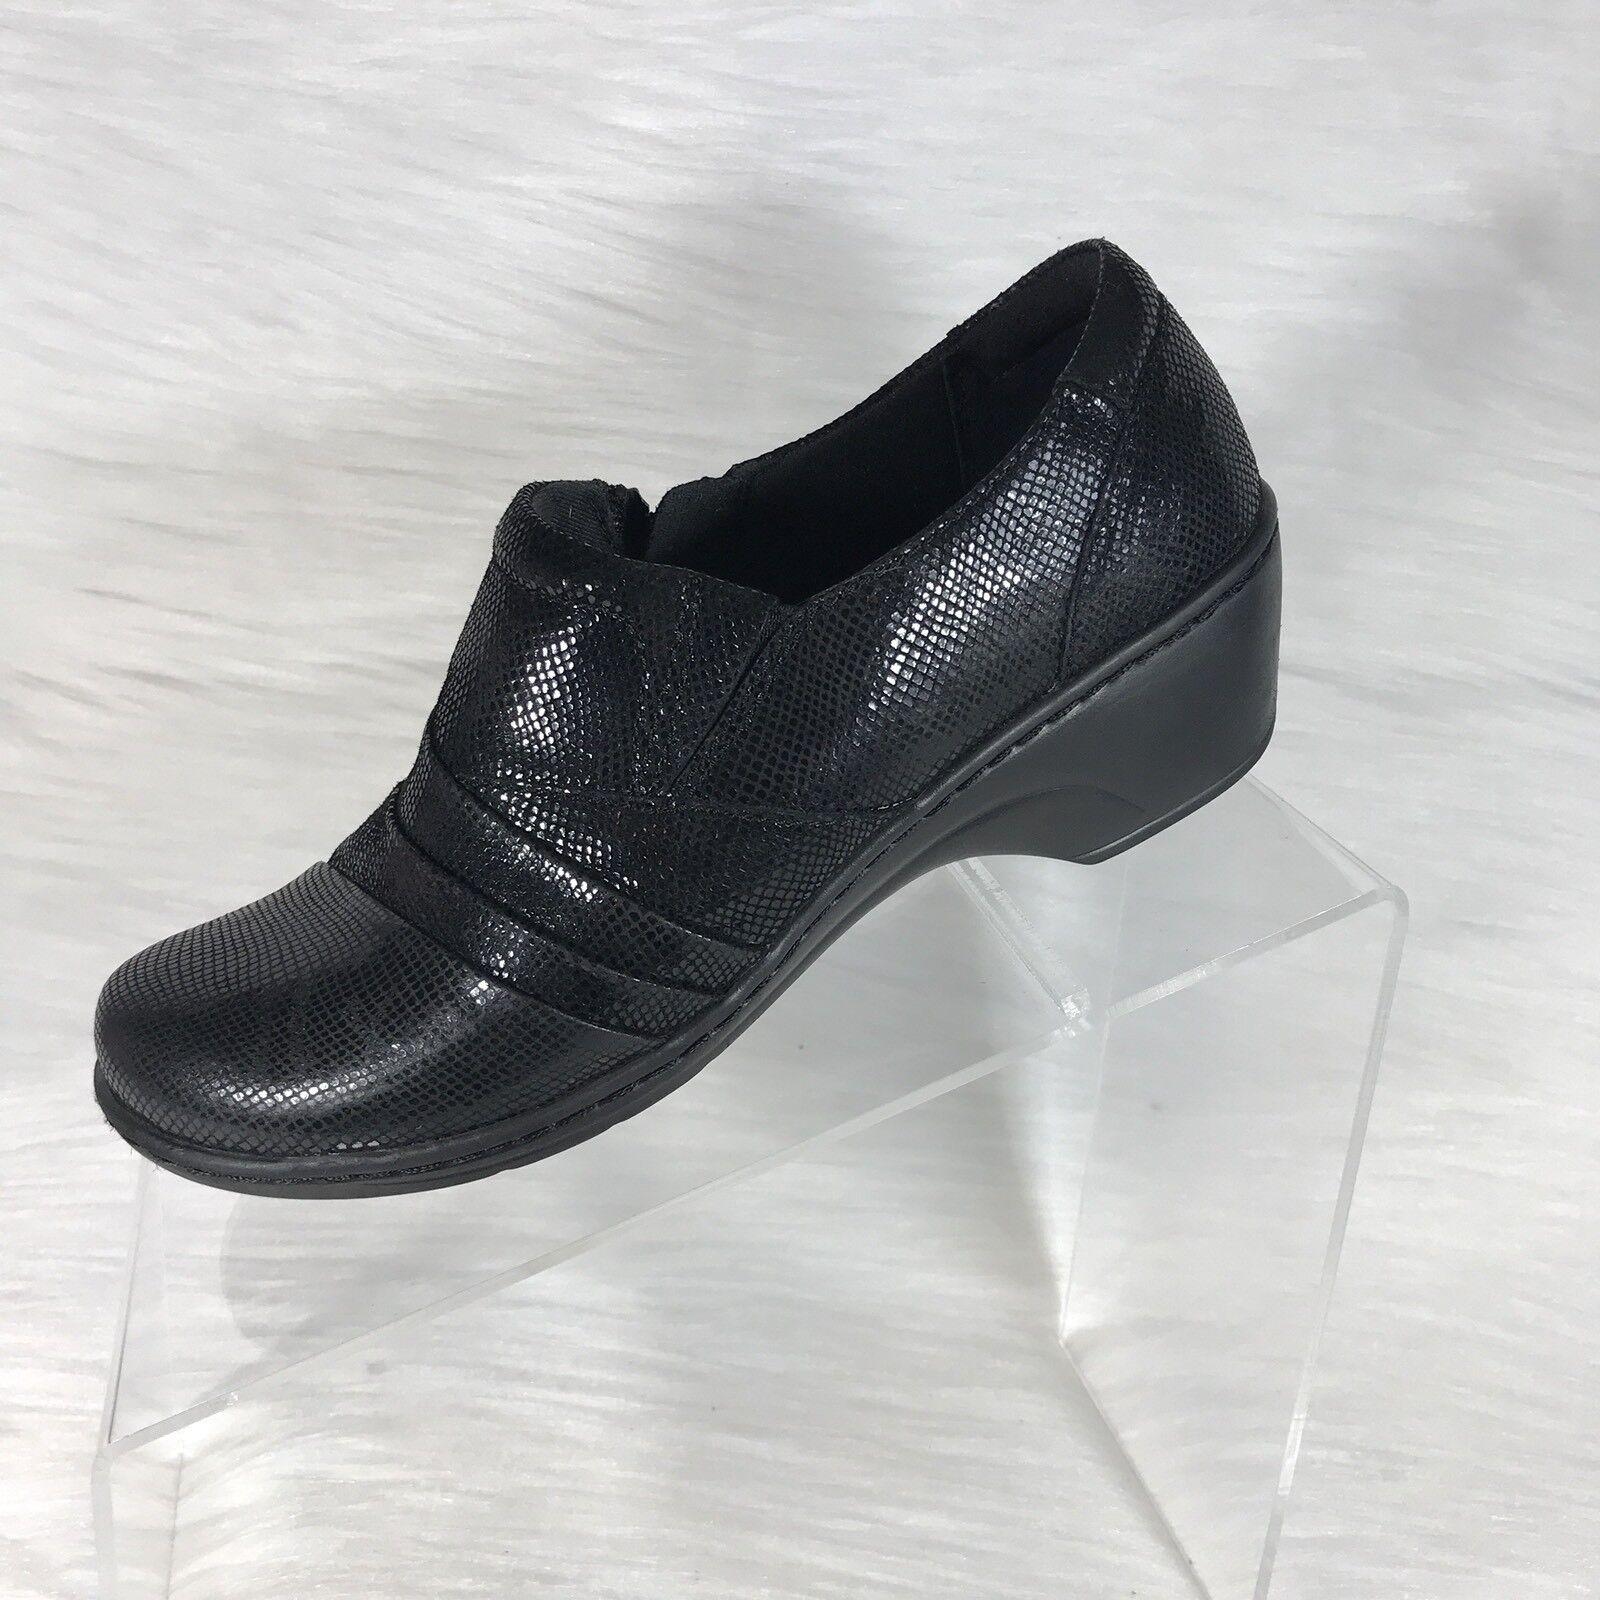 Clarks collection Mocassins En Cuir Noir Femmes Chaussures Taille 6.5 M